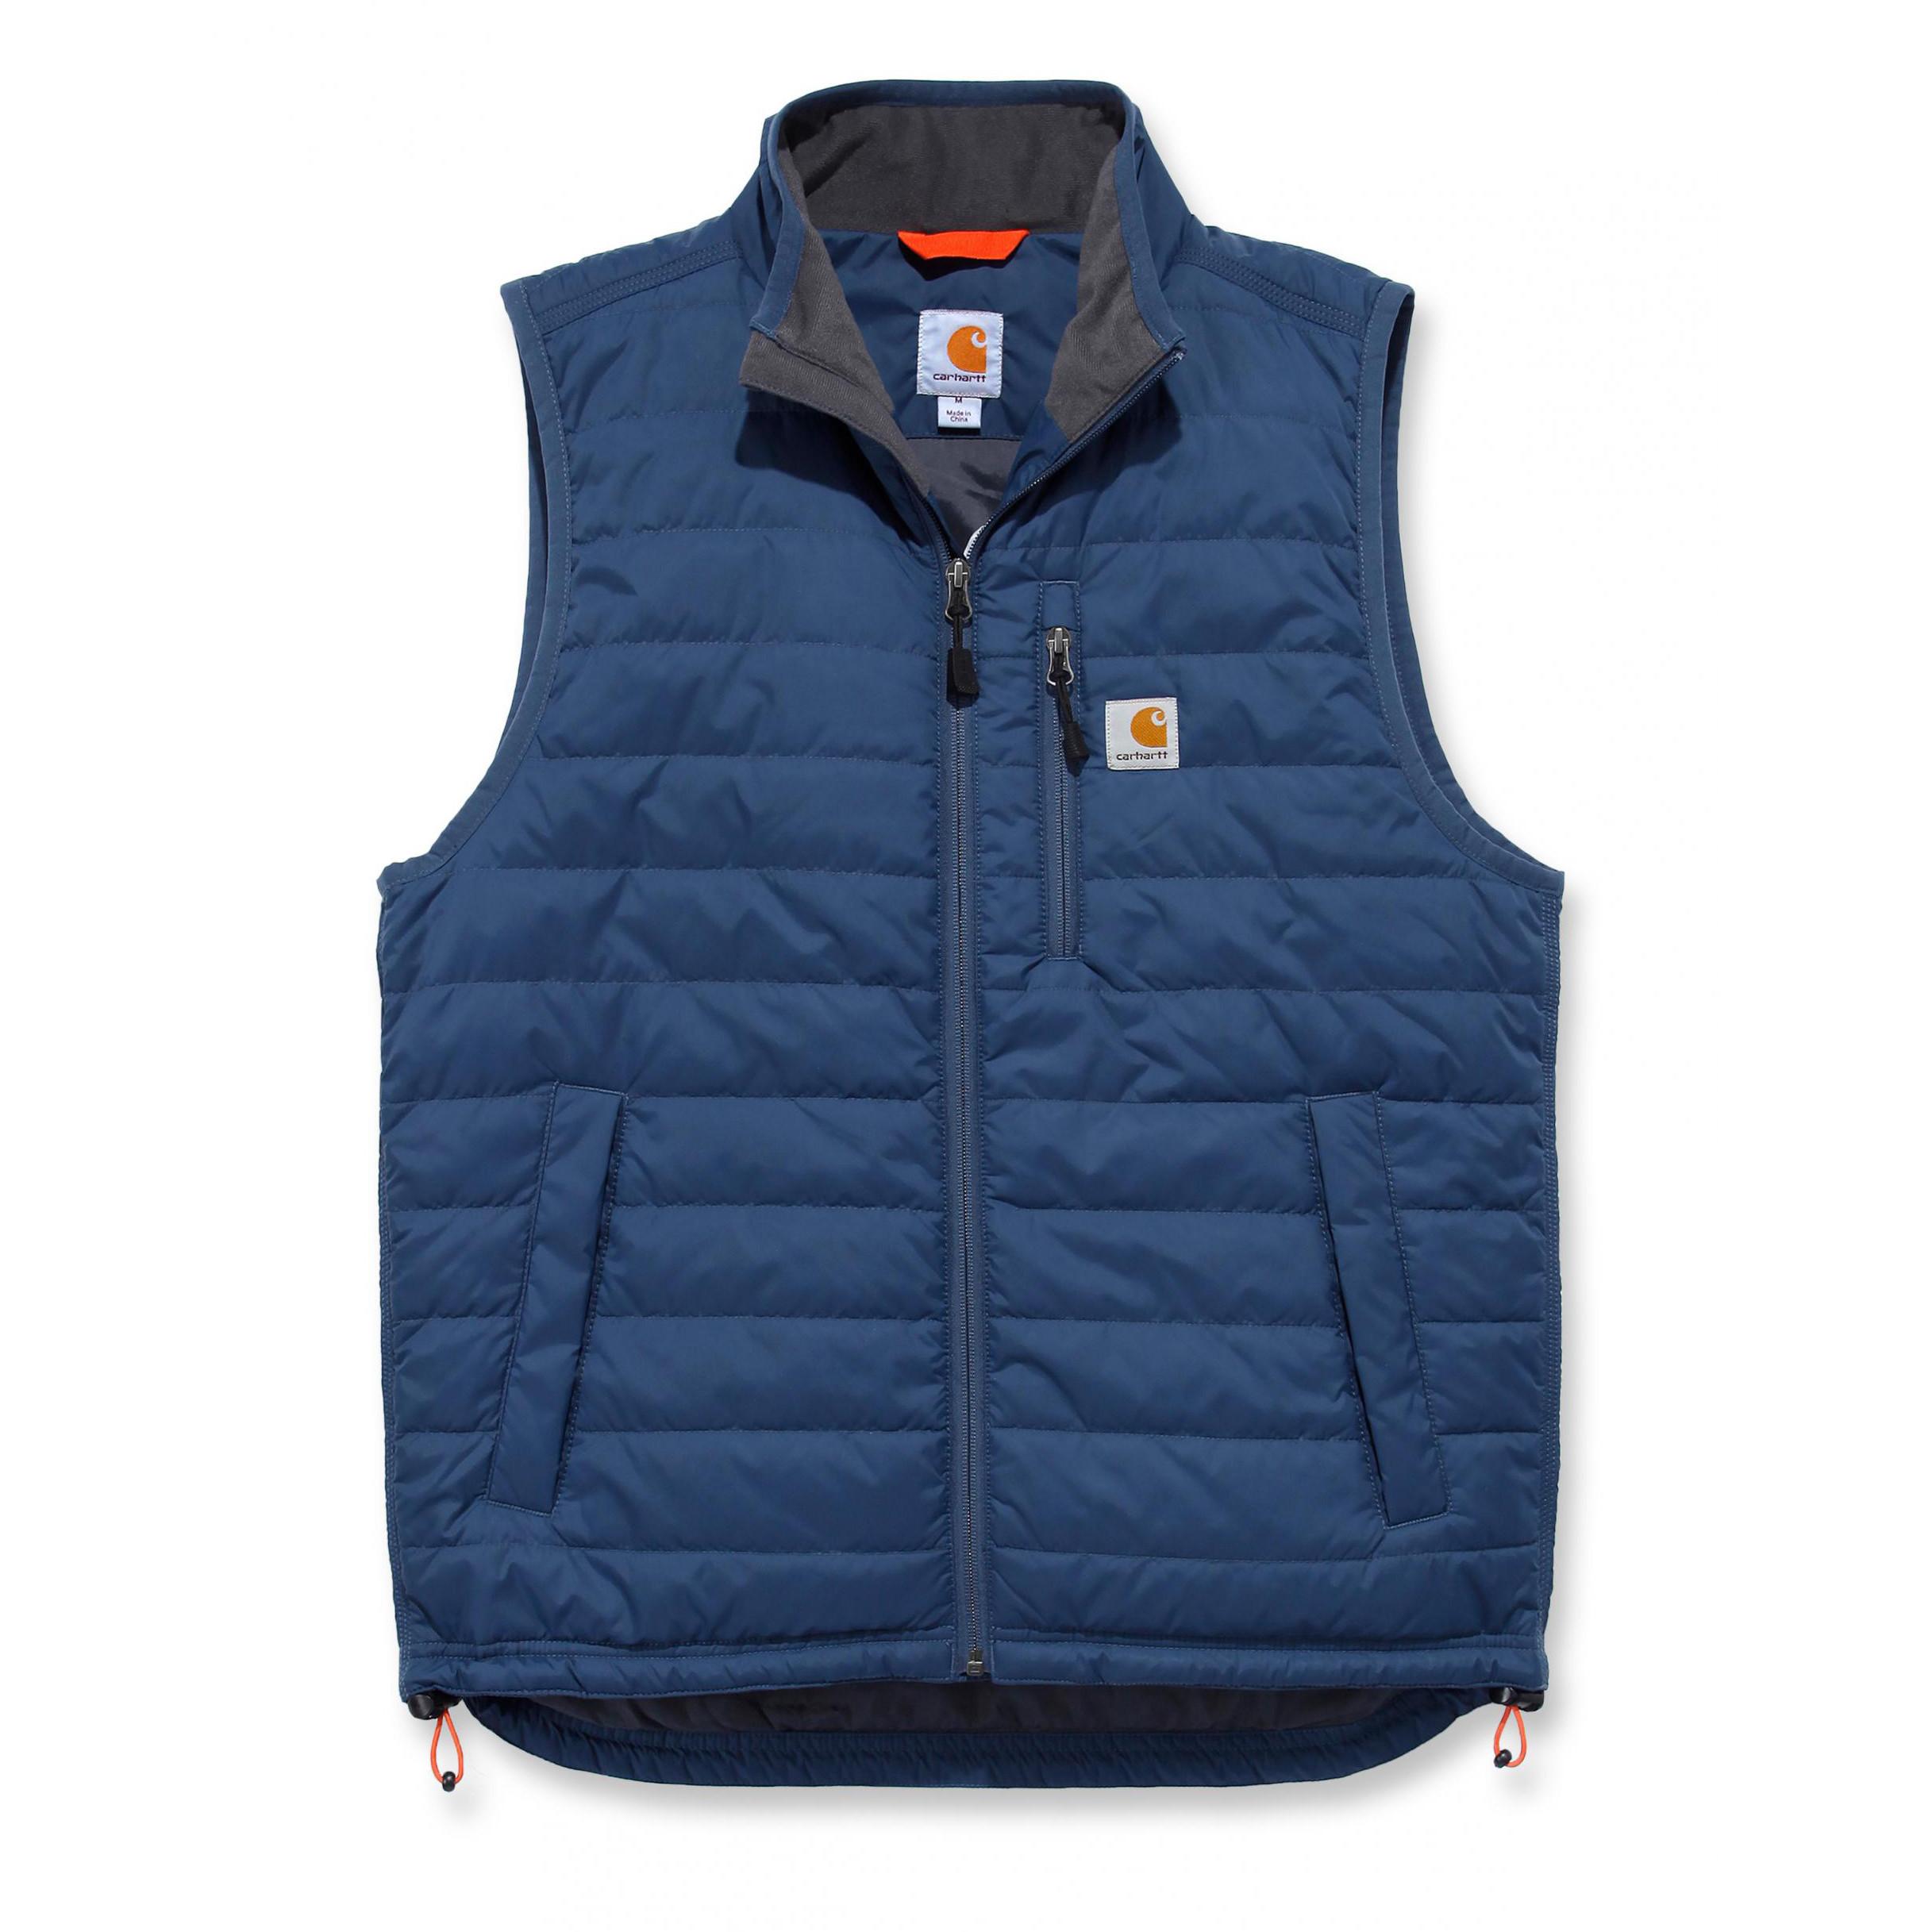 Жилет Carhartt Gilliam Vest - 102286 (Dark Blue, L)